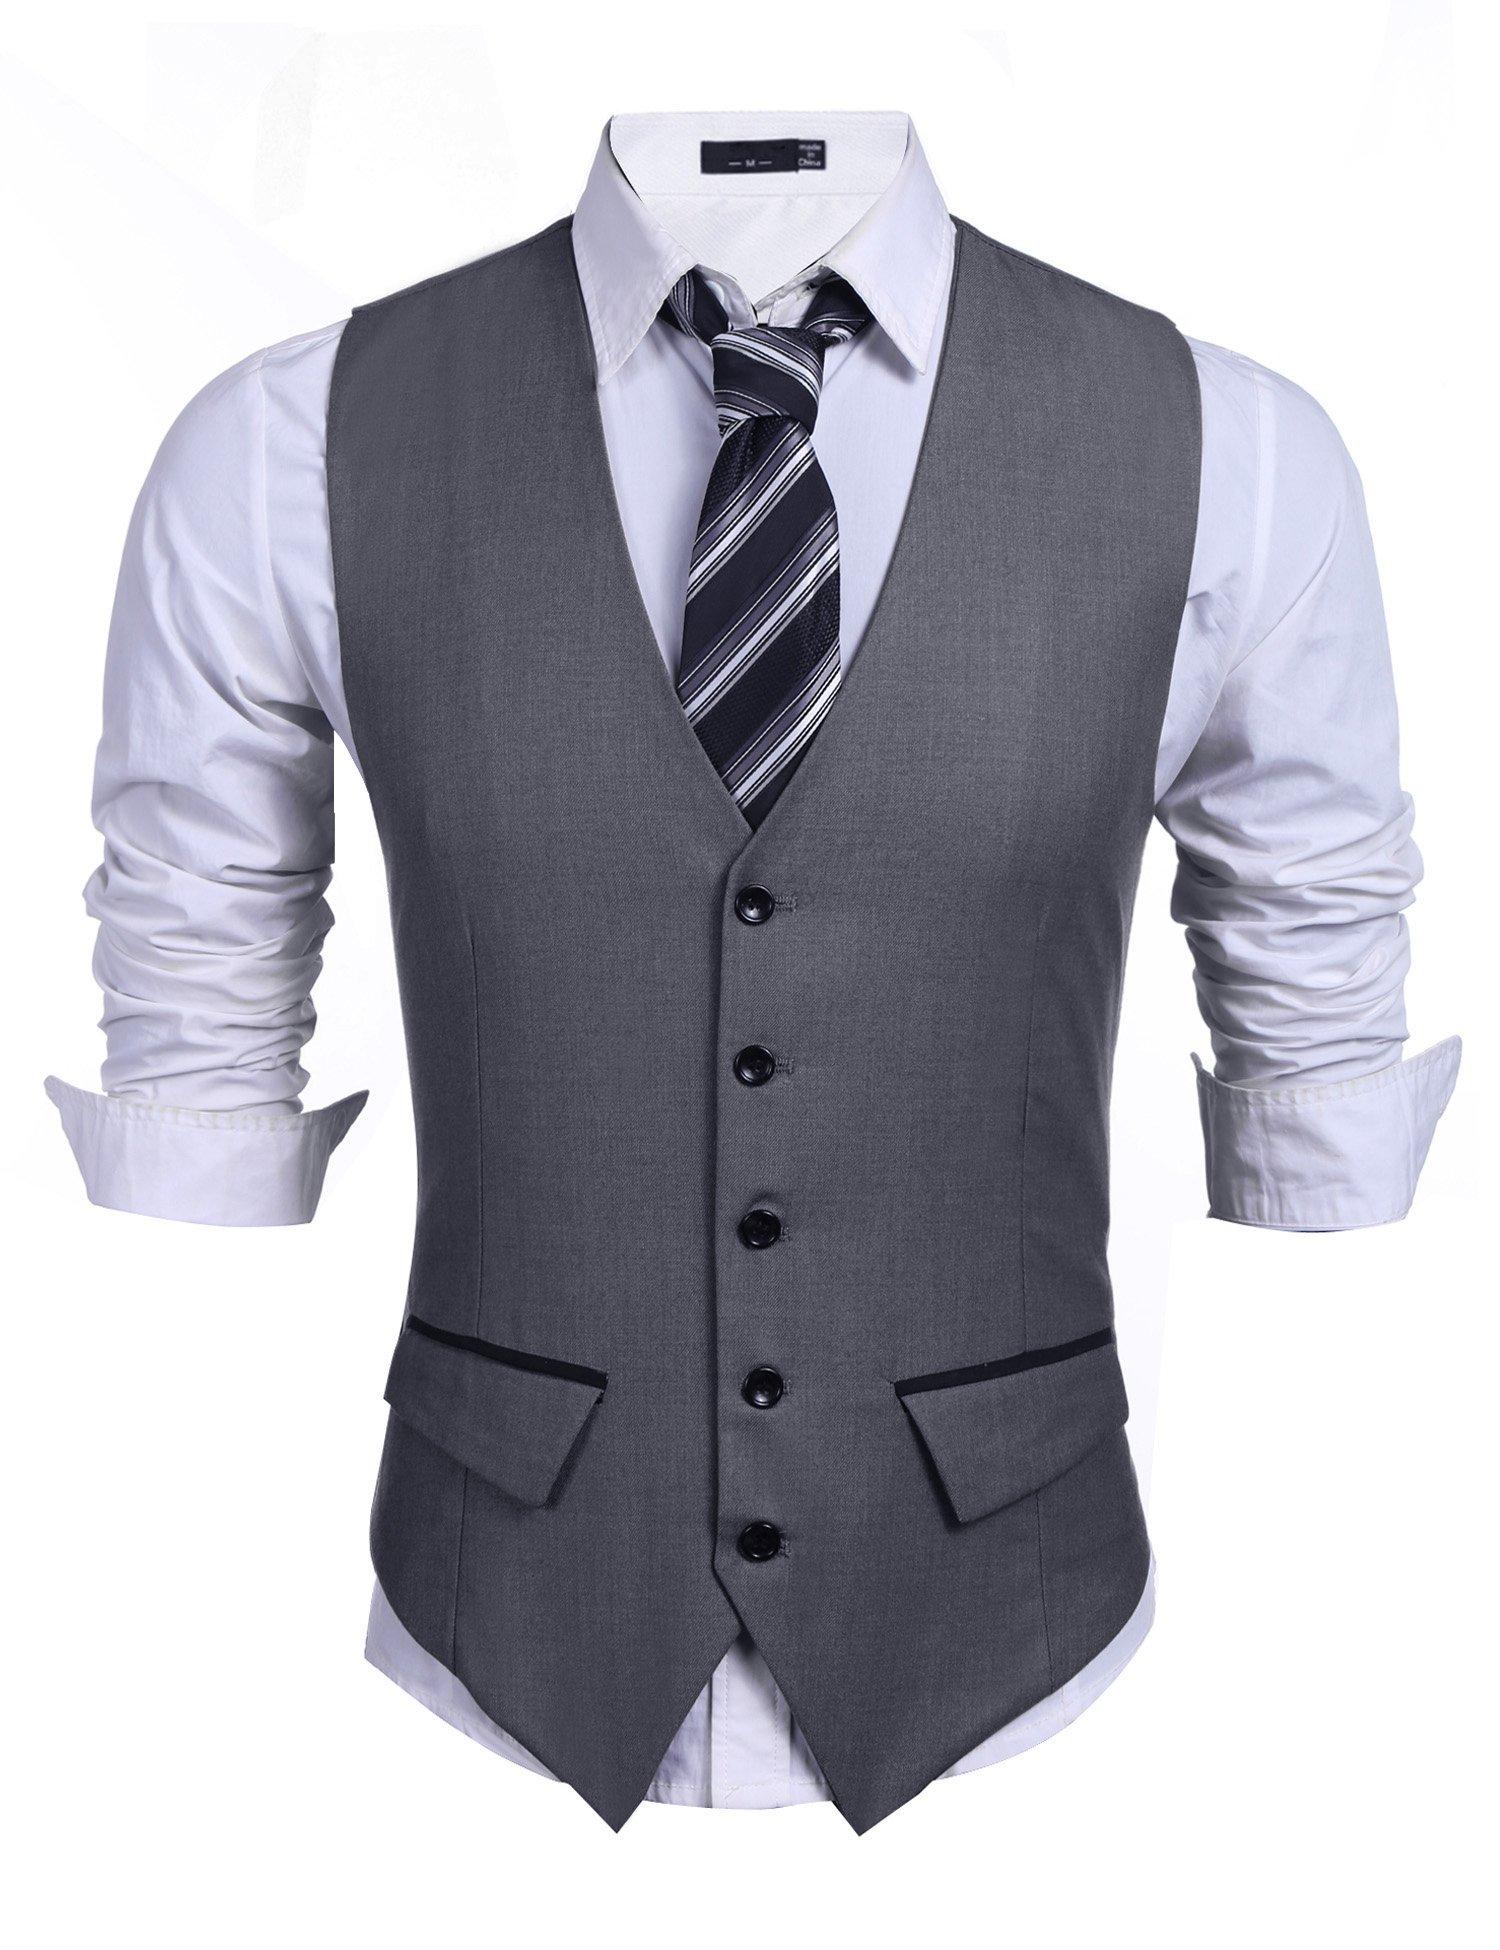 Jinidu Men's Business Suit Vest,Slim Fit Skinny Wedding Waistcoat (Medium, Solid Dark Grey)